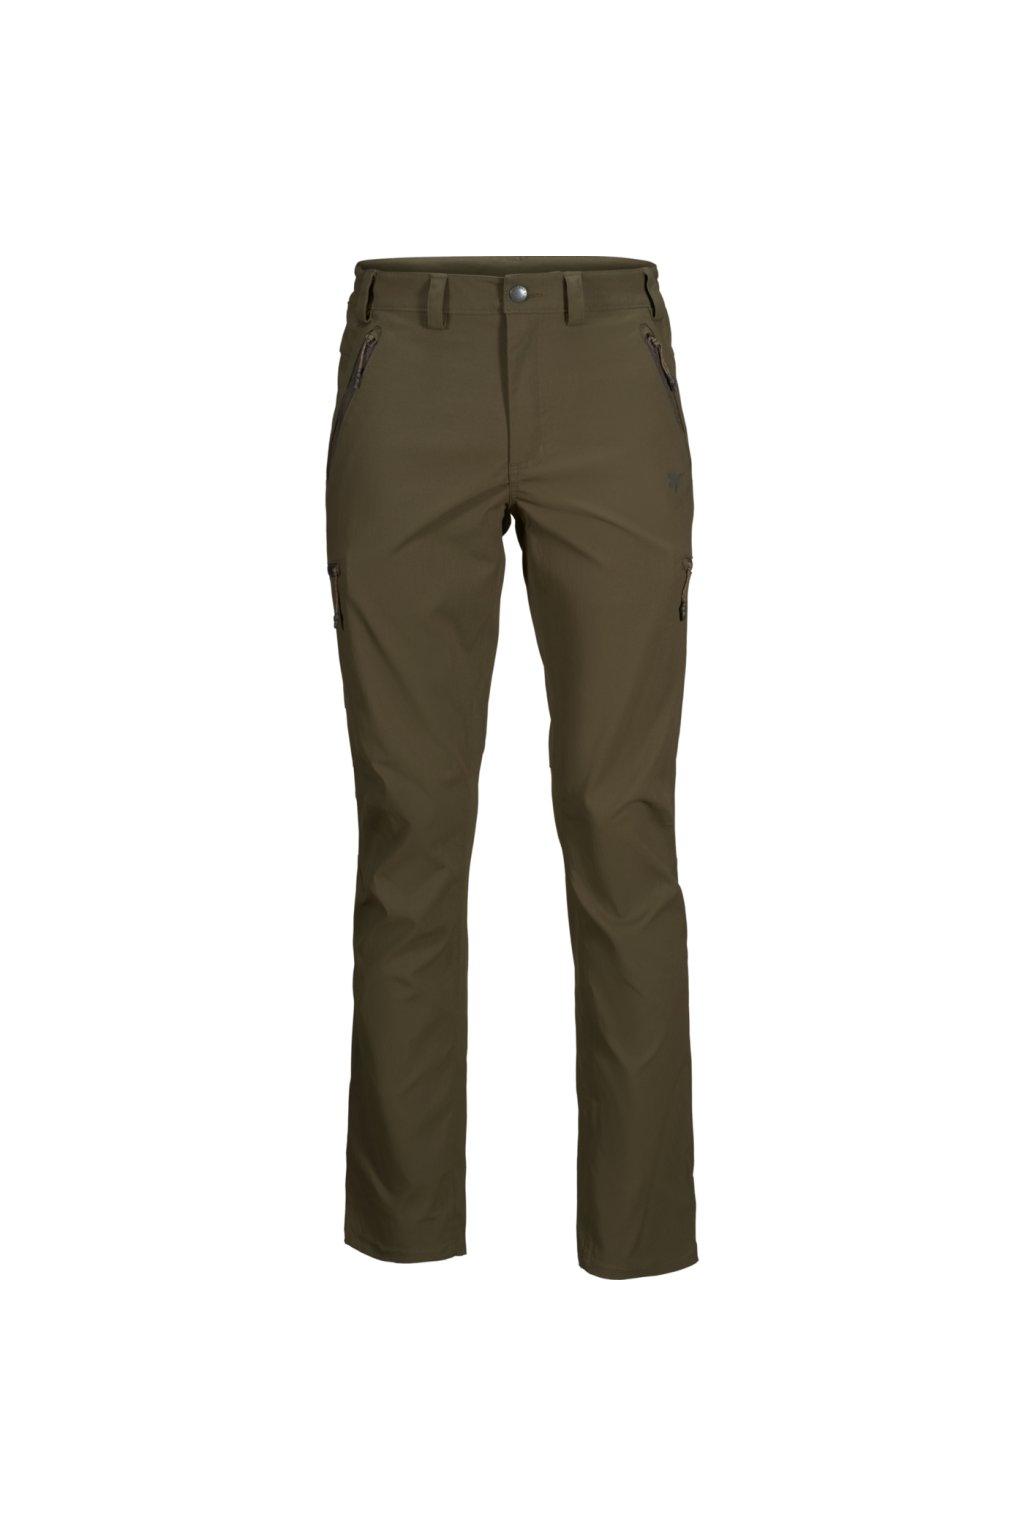 Seeland - Outdoor stretch kalhoty pánské Pine green